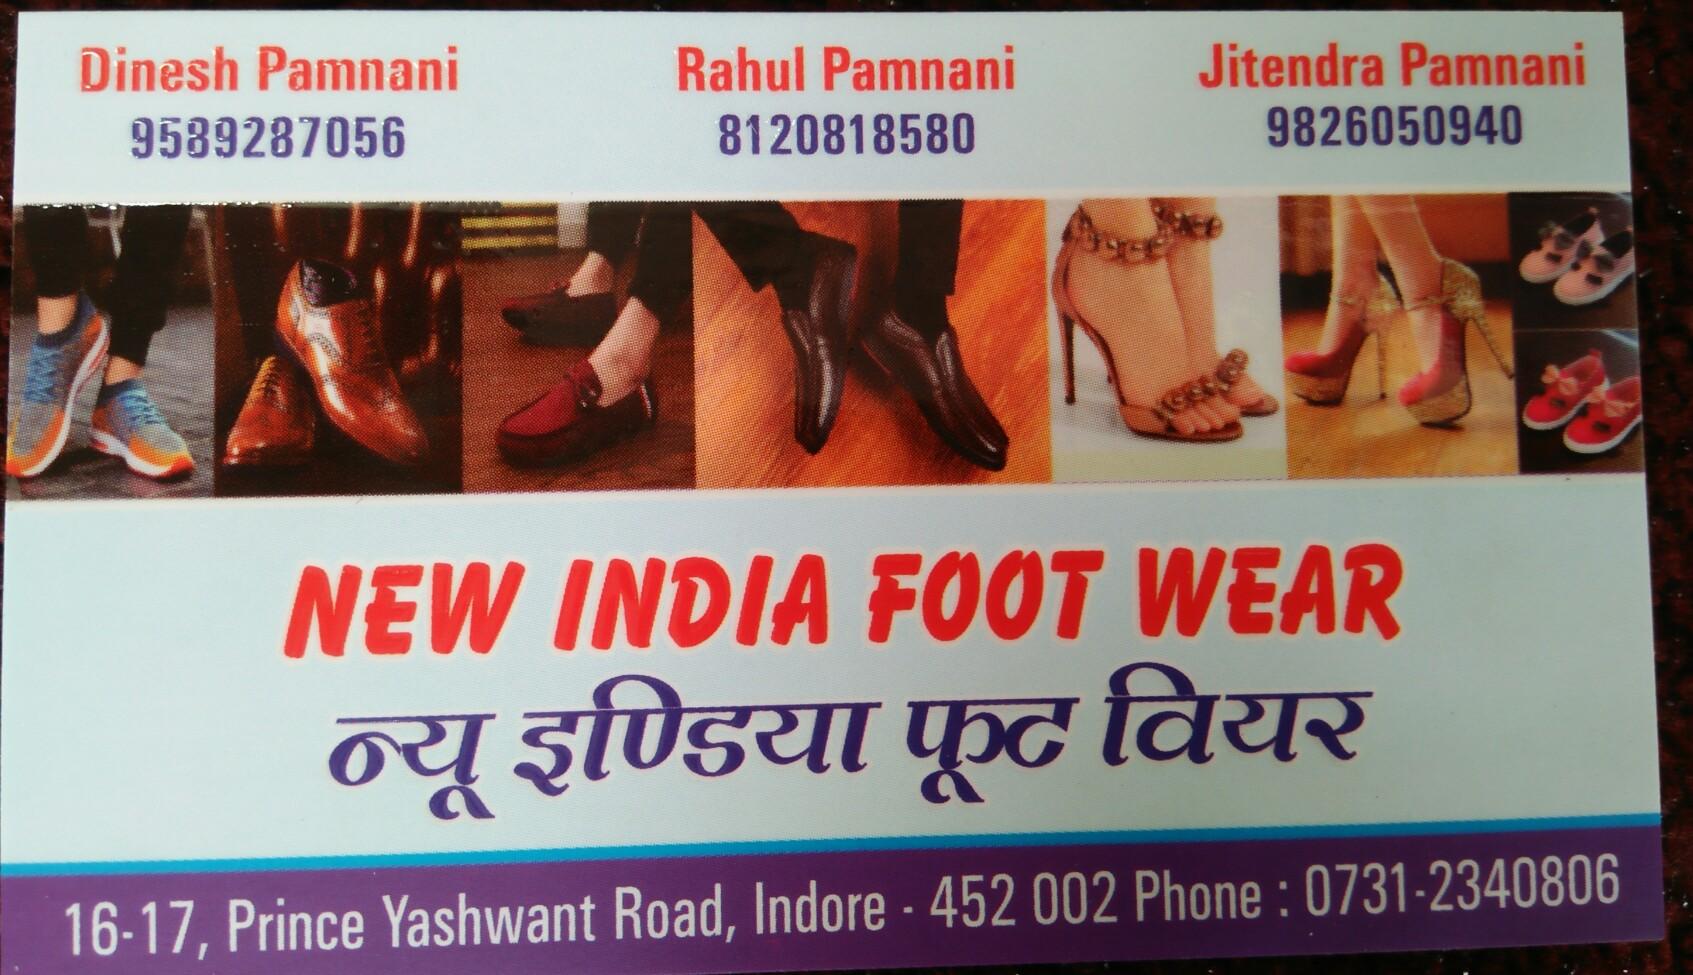 New India footwear